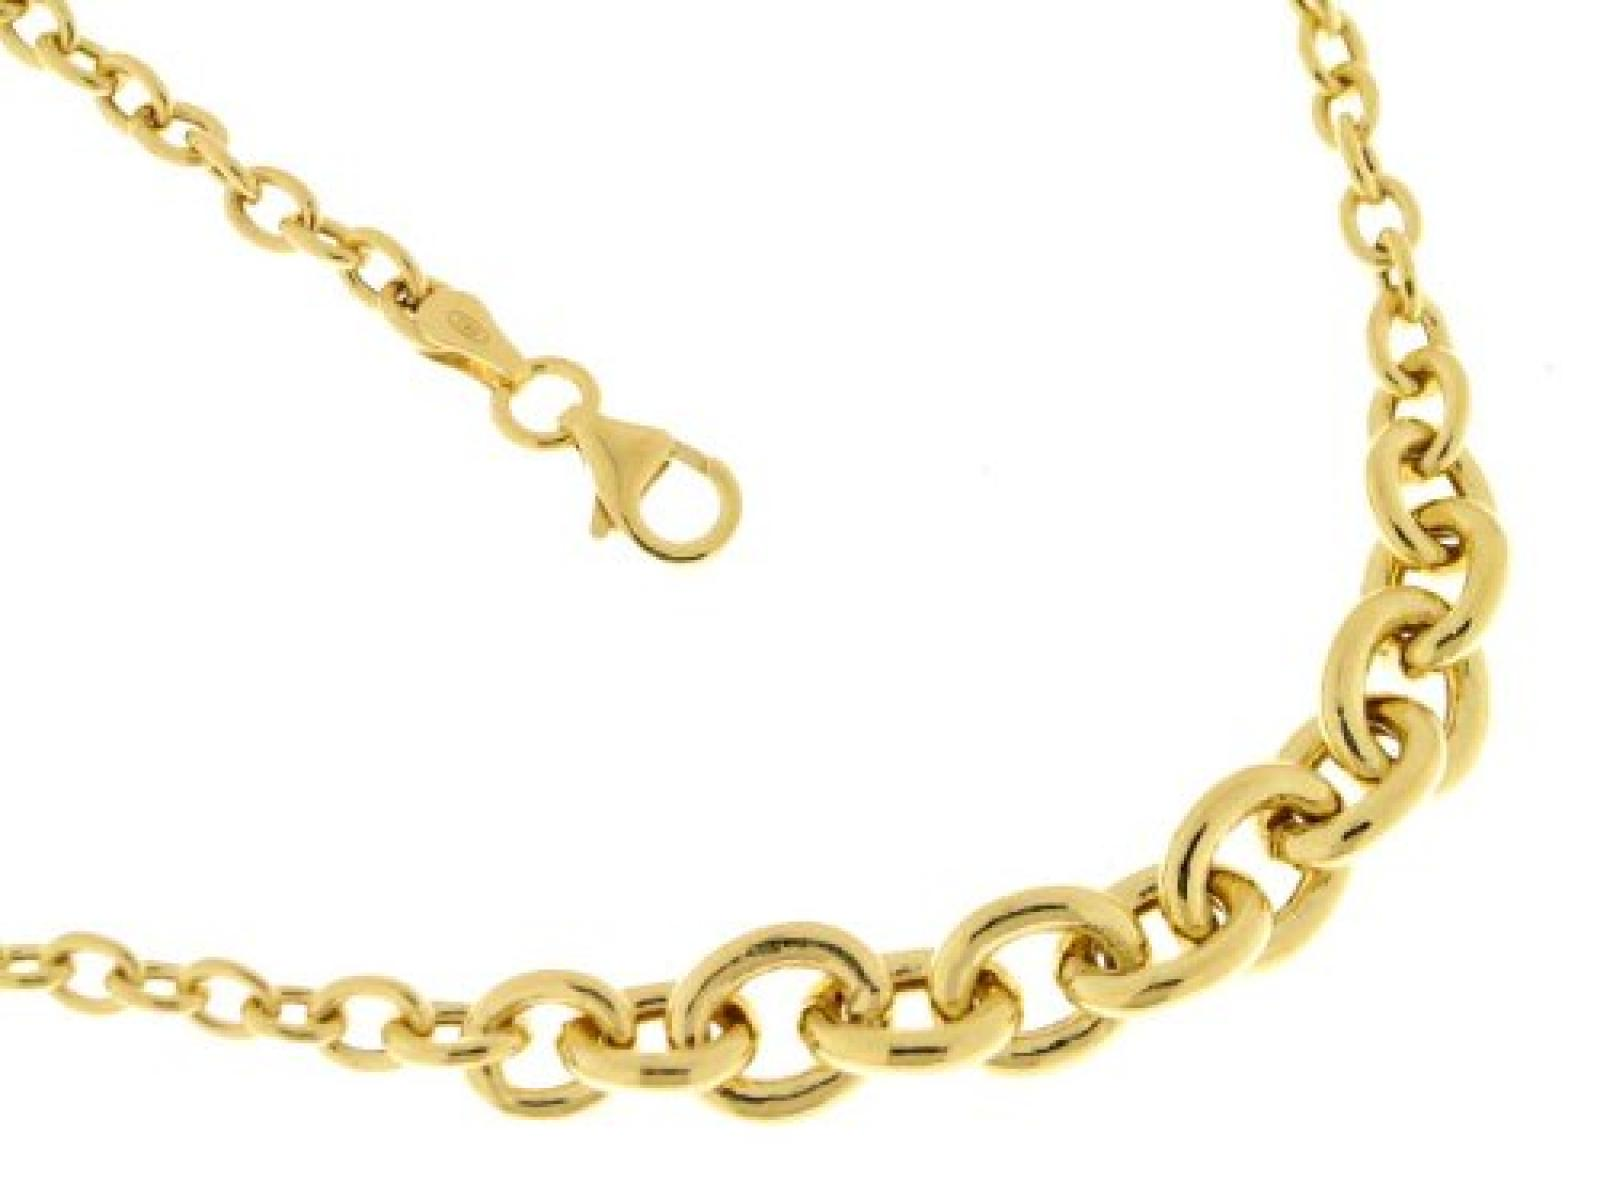 Kettenworld Damen-Halskette ohne Anhänger 925 Sterling Silber vergoldet 294073